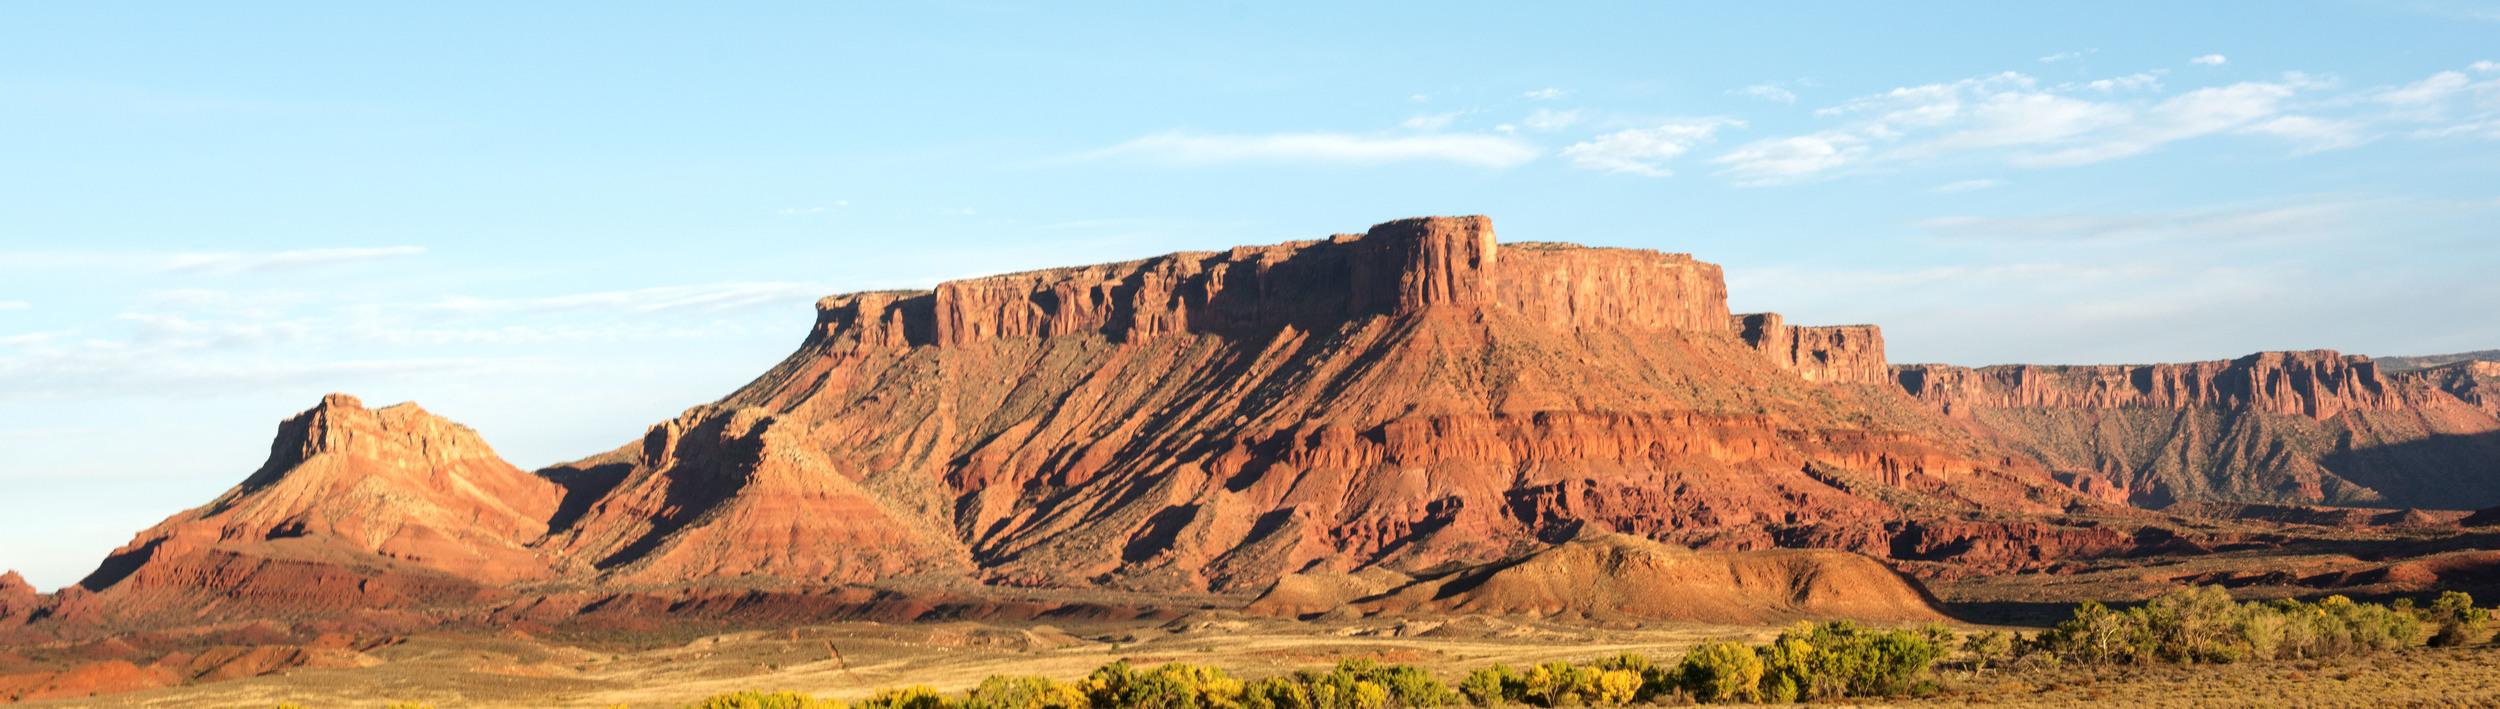 arches-national-park-utah-12